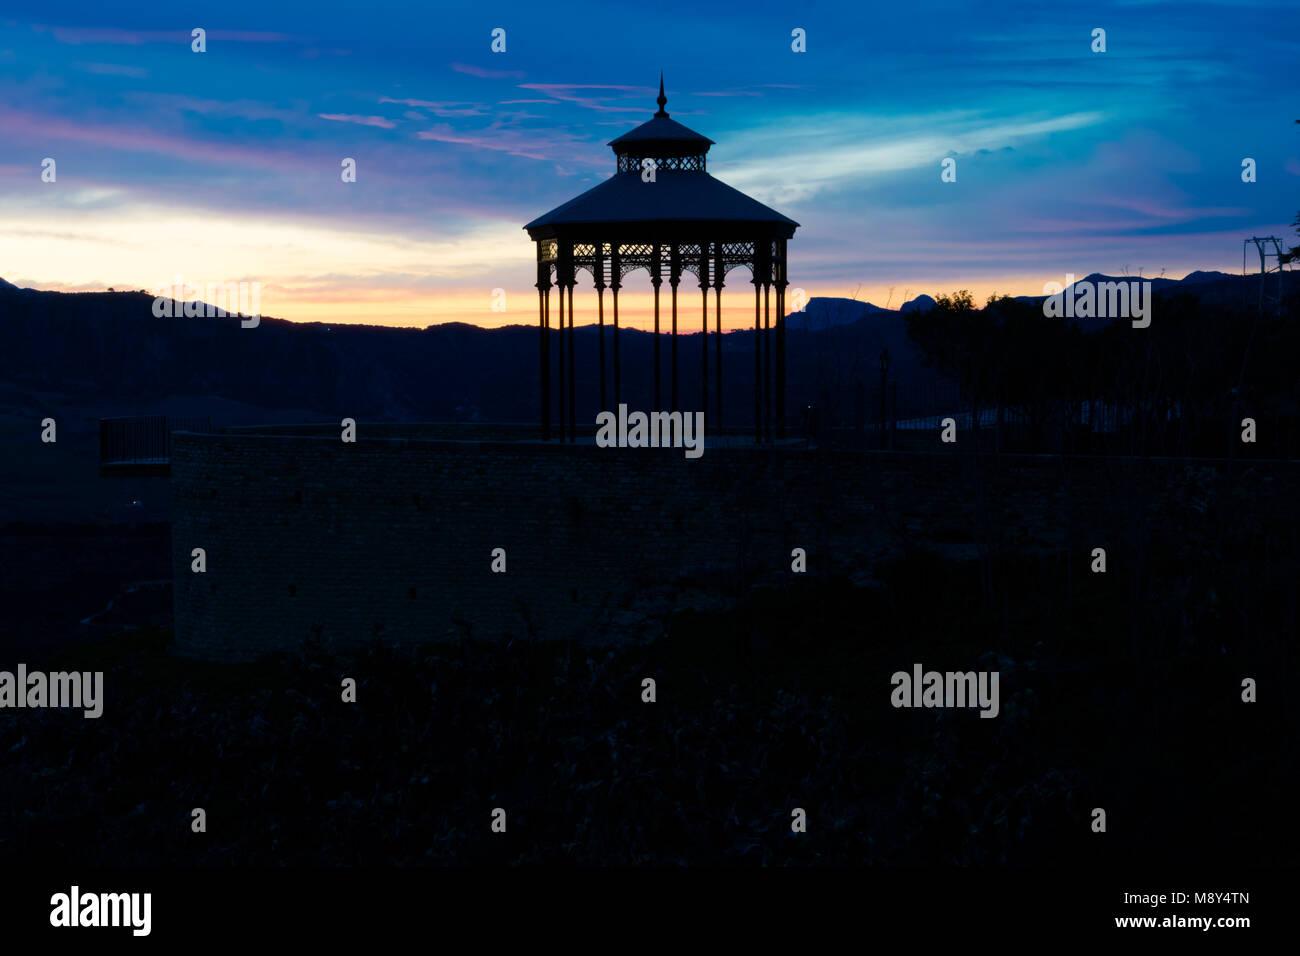 Sunset view of the Ronda Viewpoint (Mirador de Ronda) and the old pergola. Ronda, Spain Stock Photo